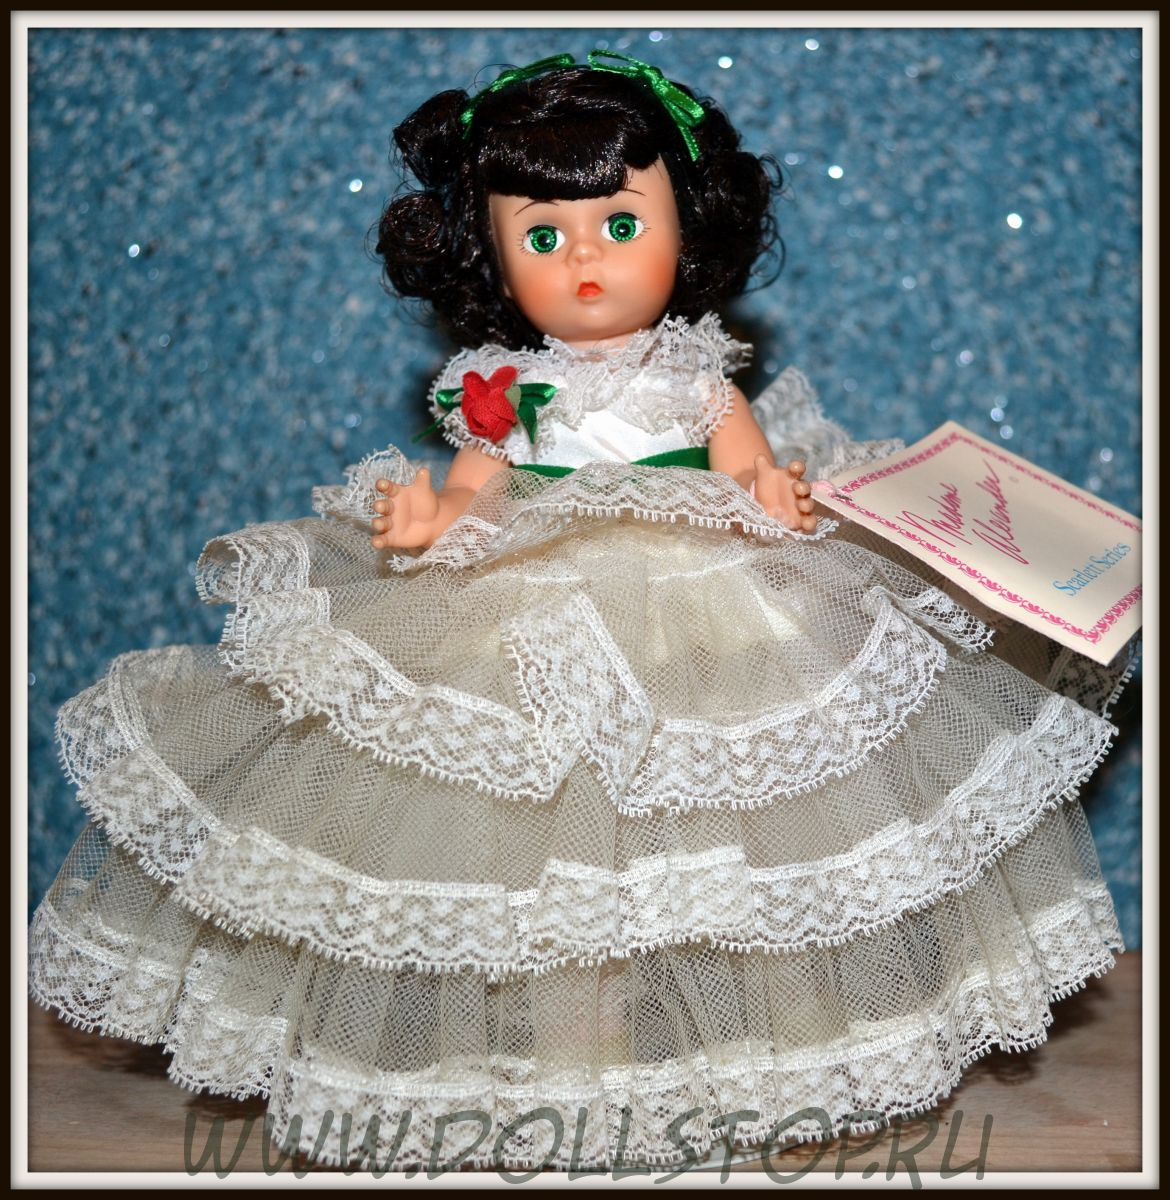 "Коллекционная кукла Скарлетт из ""Унесенных ветром"" от Мадам Александер - Madame Alexander Scarlett 631 Gone With the Wind 8"" Doll w/doll stand"